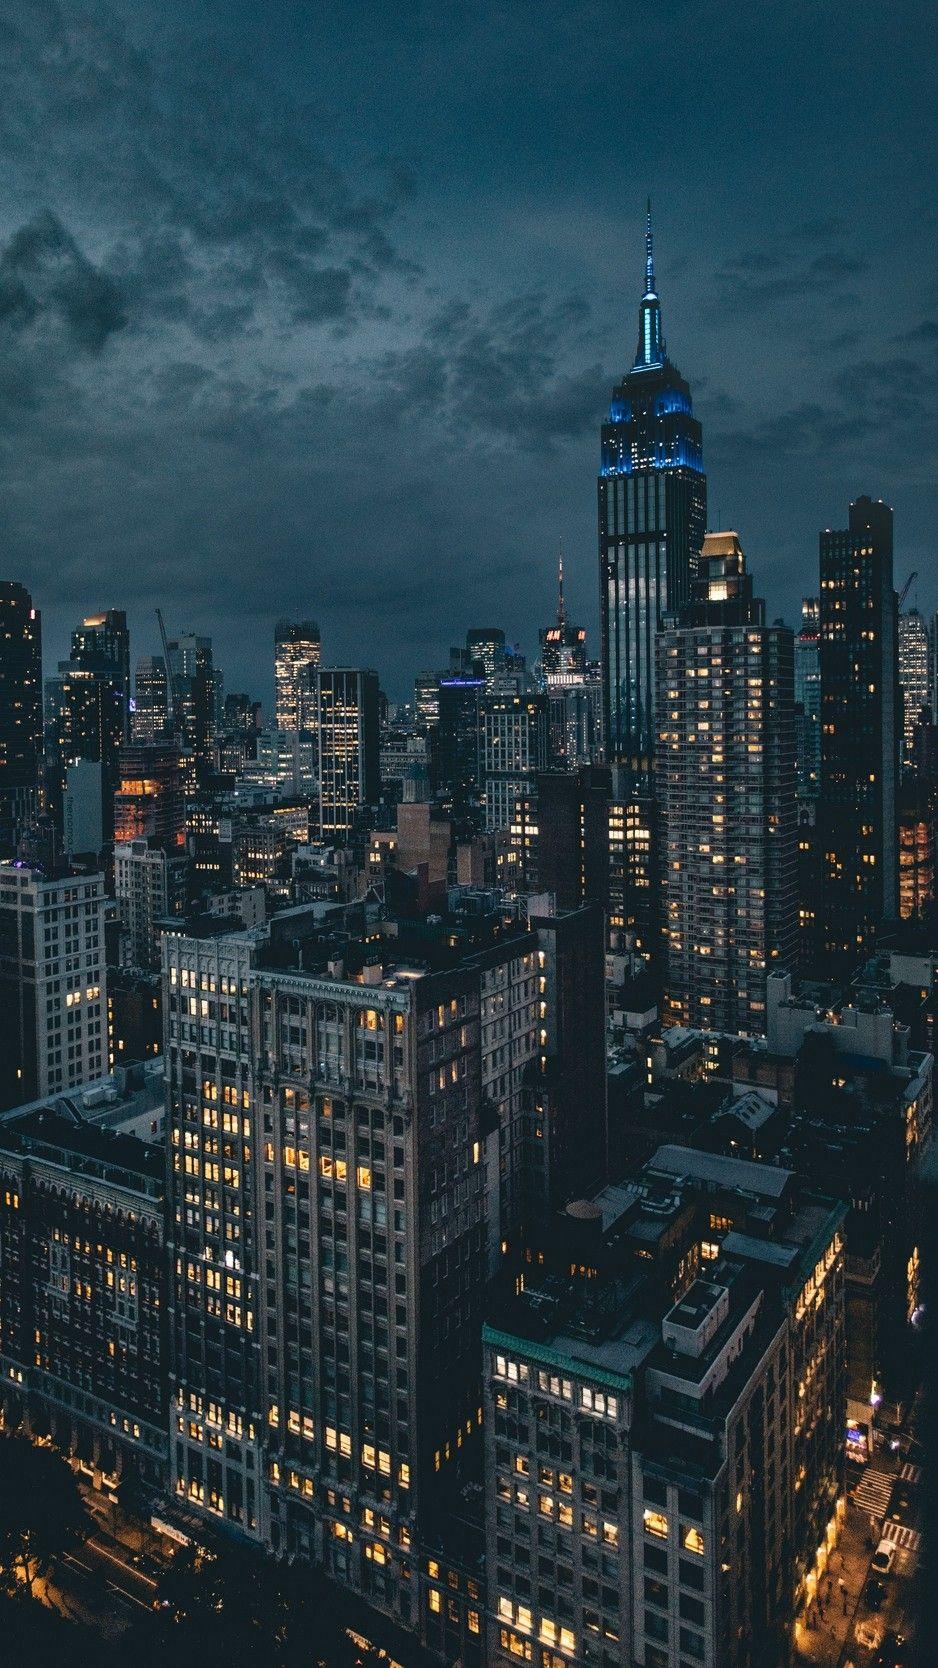 Iphone Wallpaper New York 346 City Aesthetic City Landscape City Wallpaper